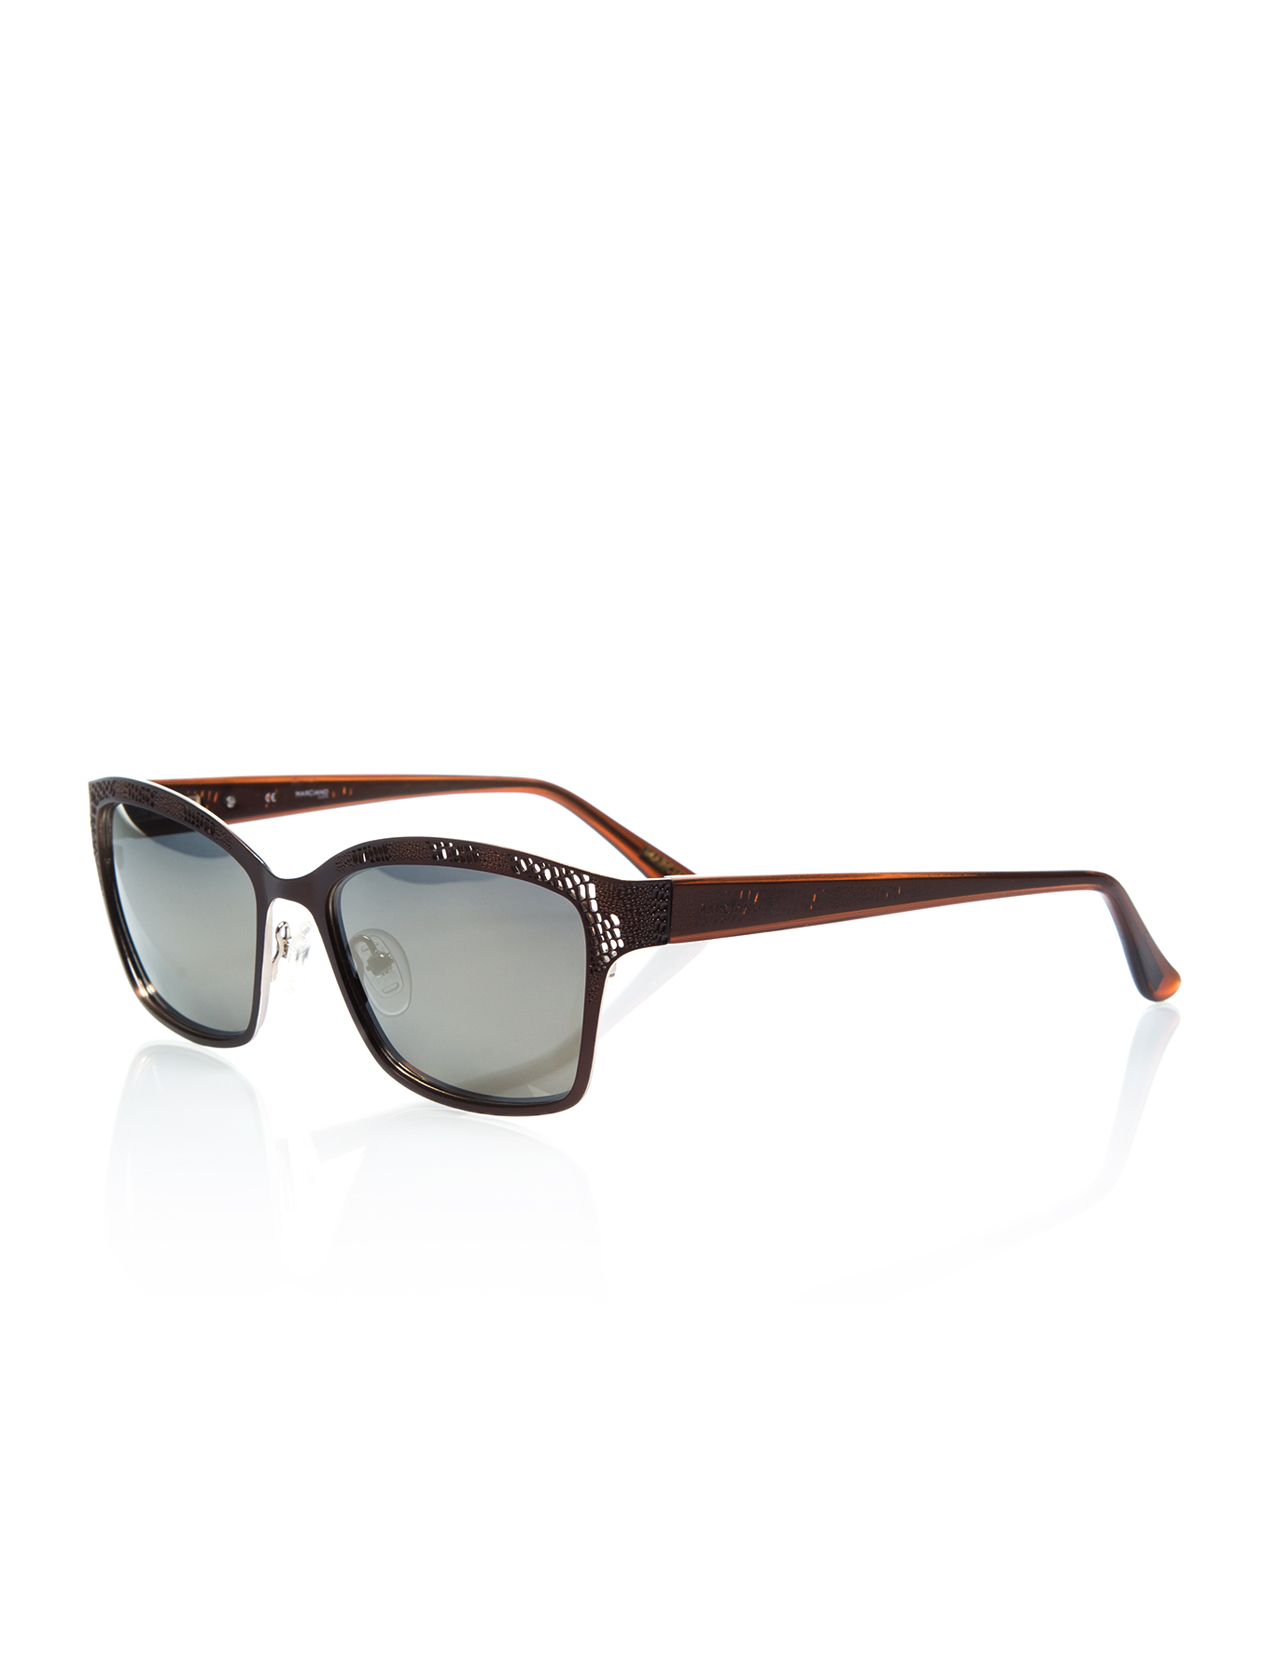 Women's sunglasses gu 0274 049 metal Brown unspecified 53-guess